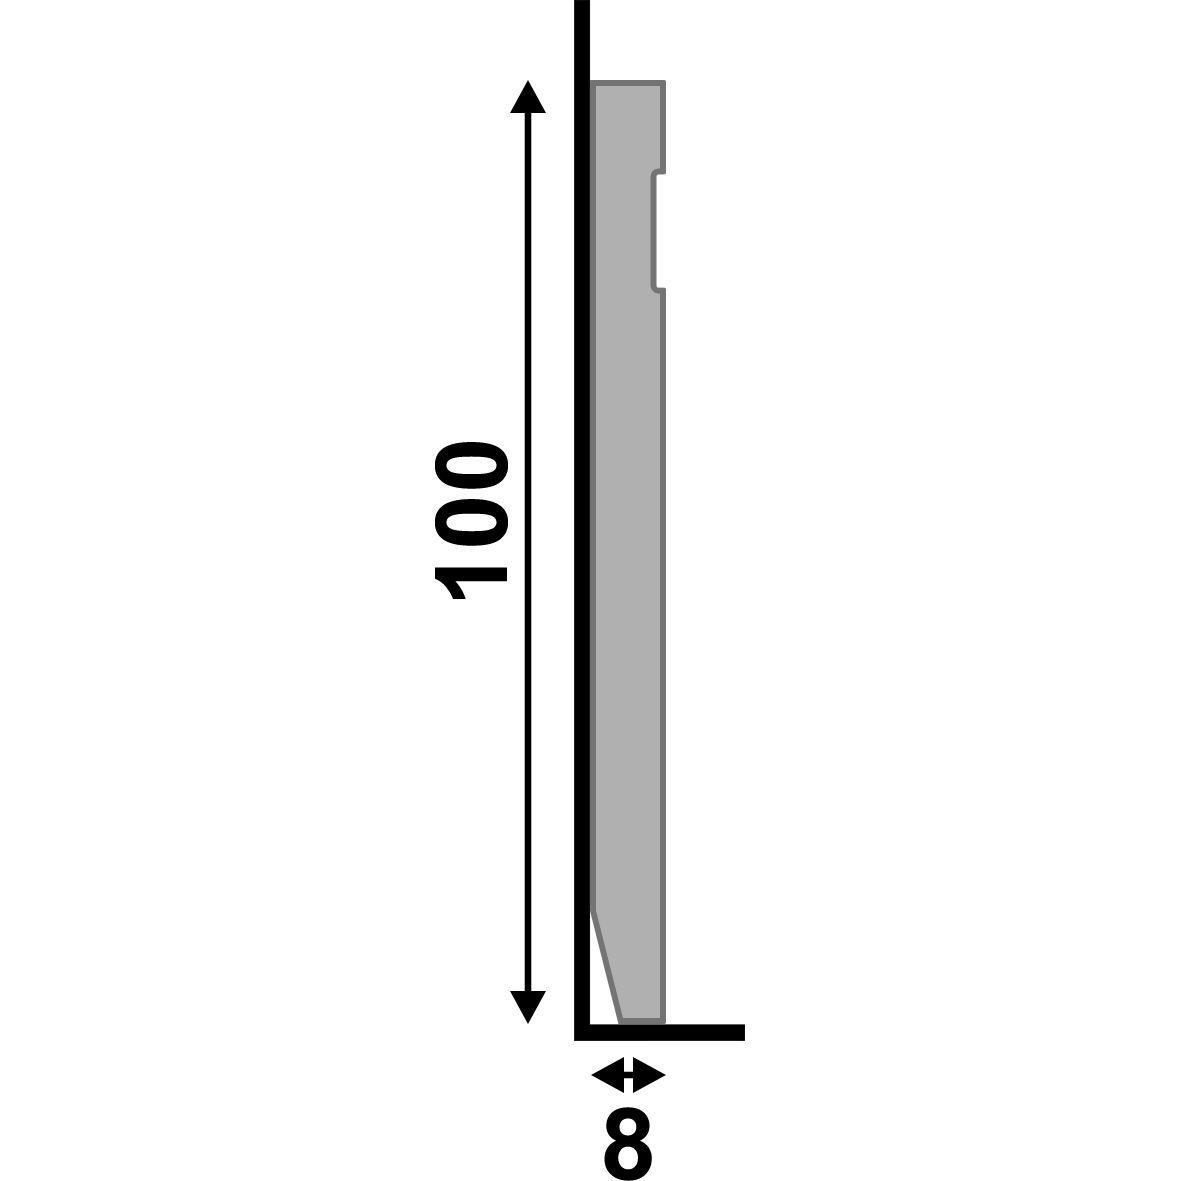 Rodapé Branco Premium 10 Cm Frisado De Poliestireno